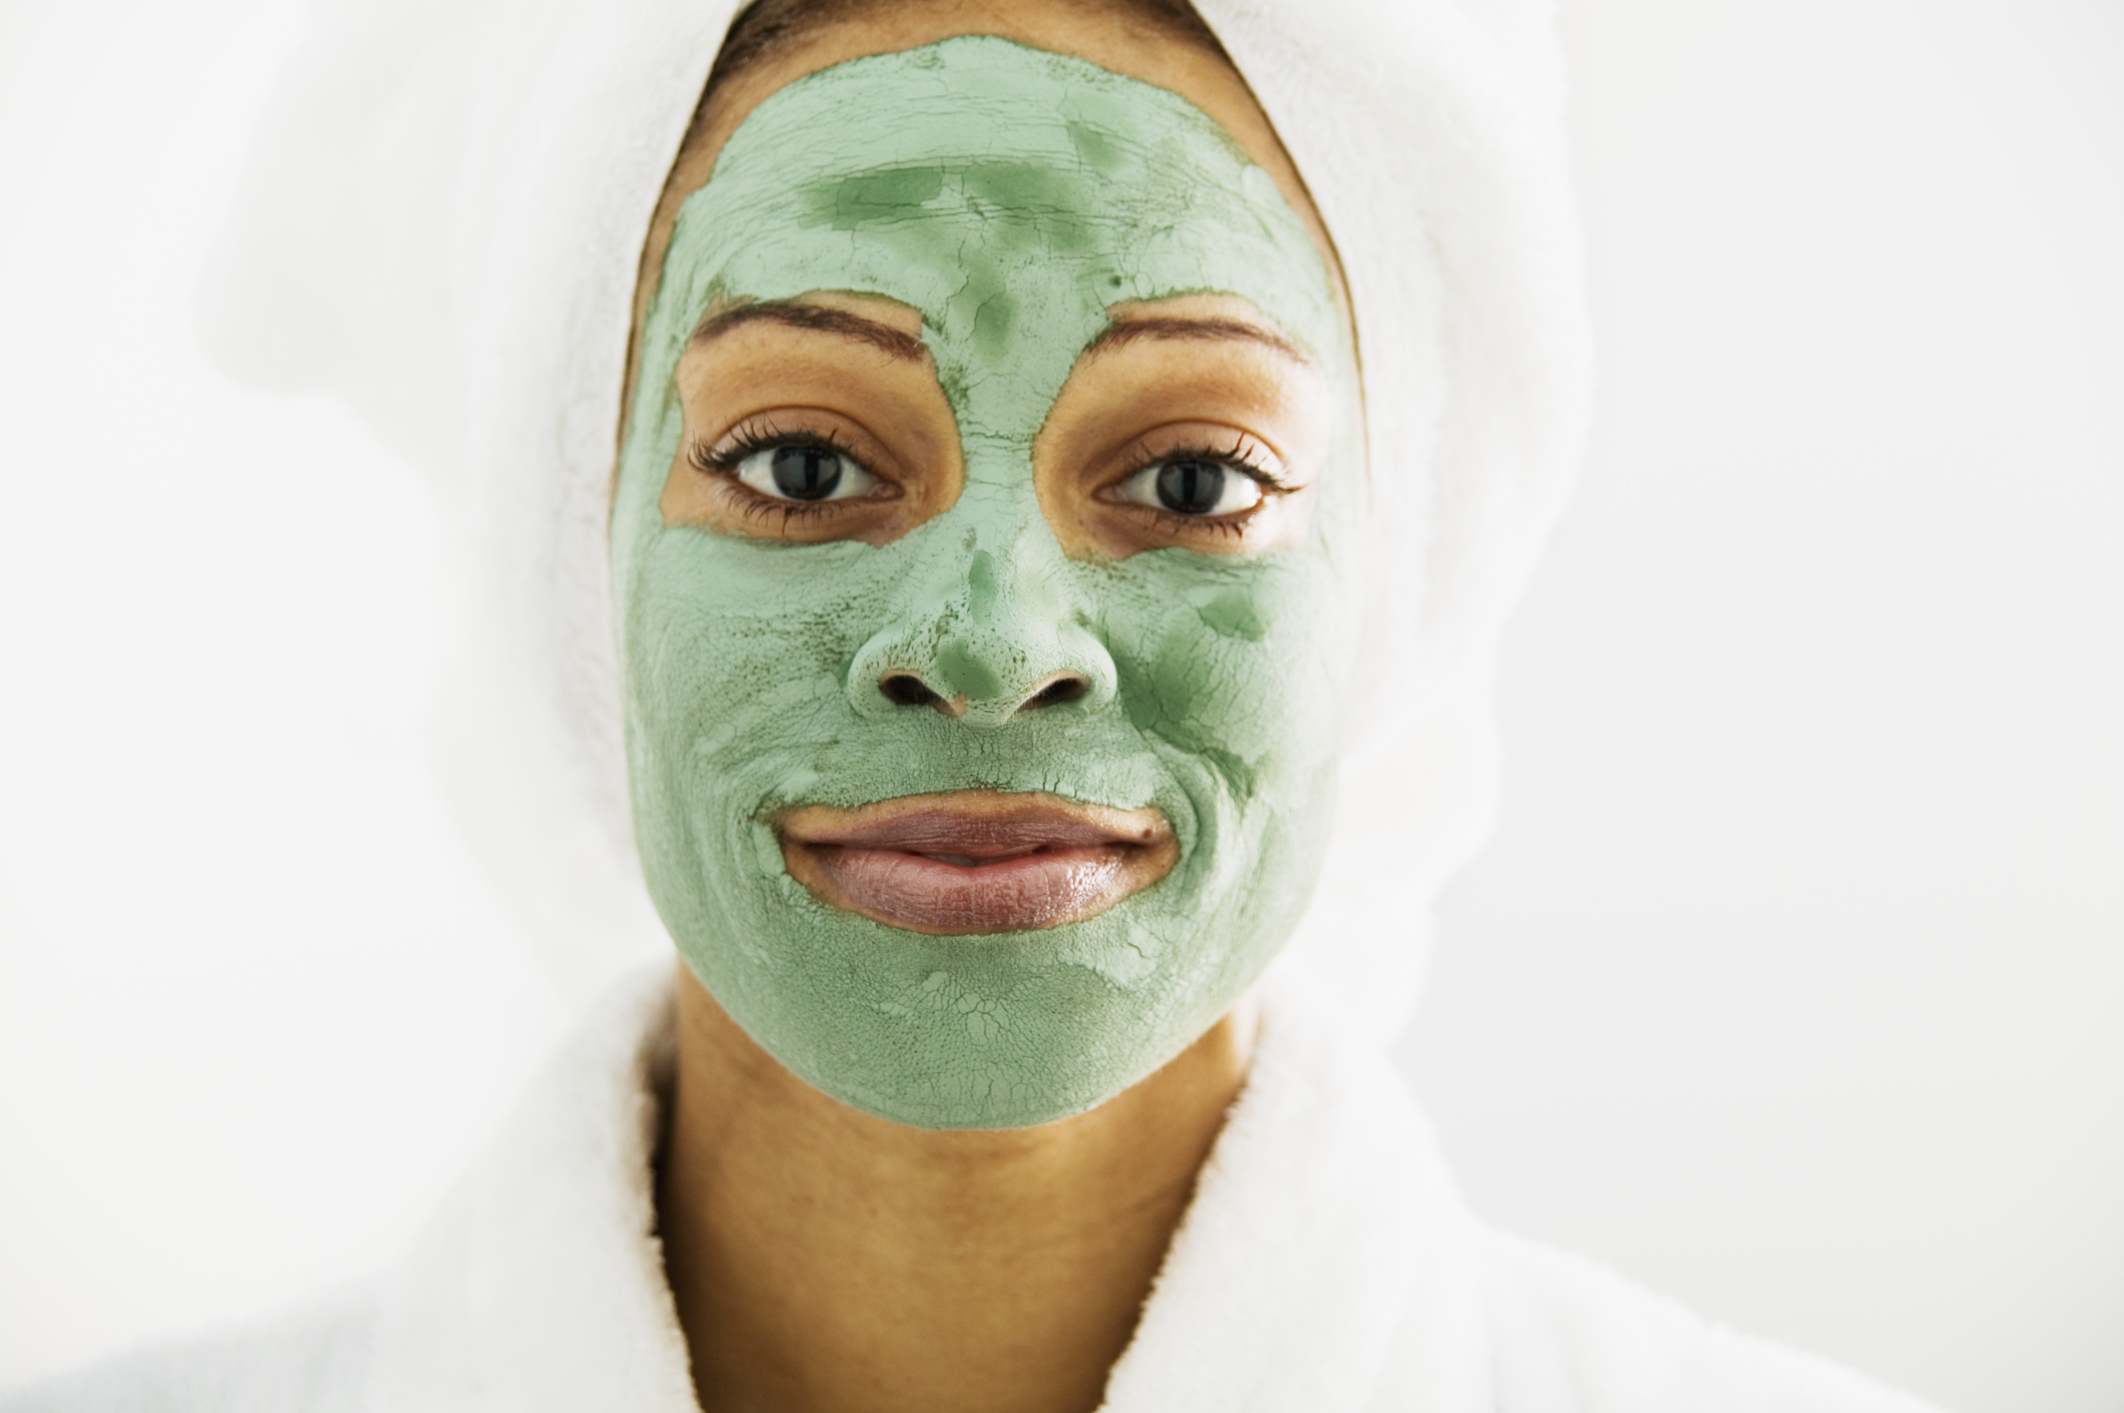 How to Make Homemade Whitening Facial Masks for Oily Skin